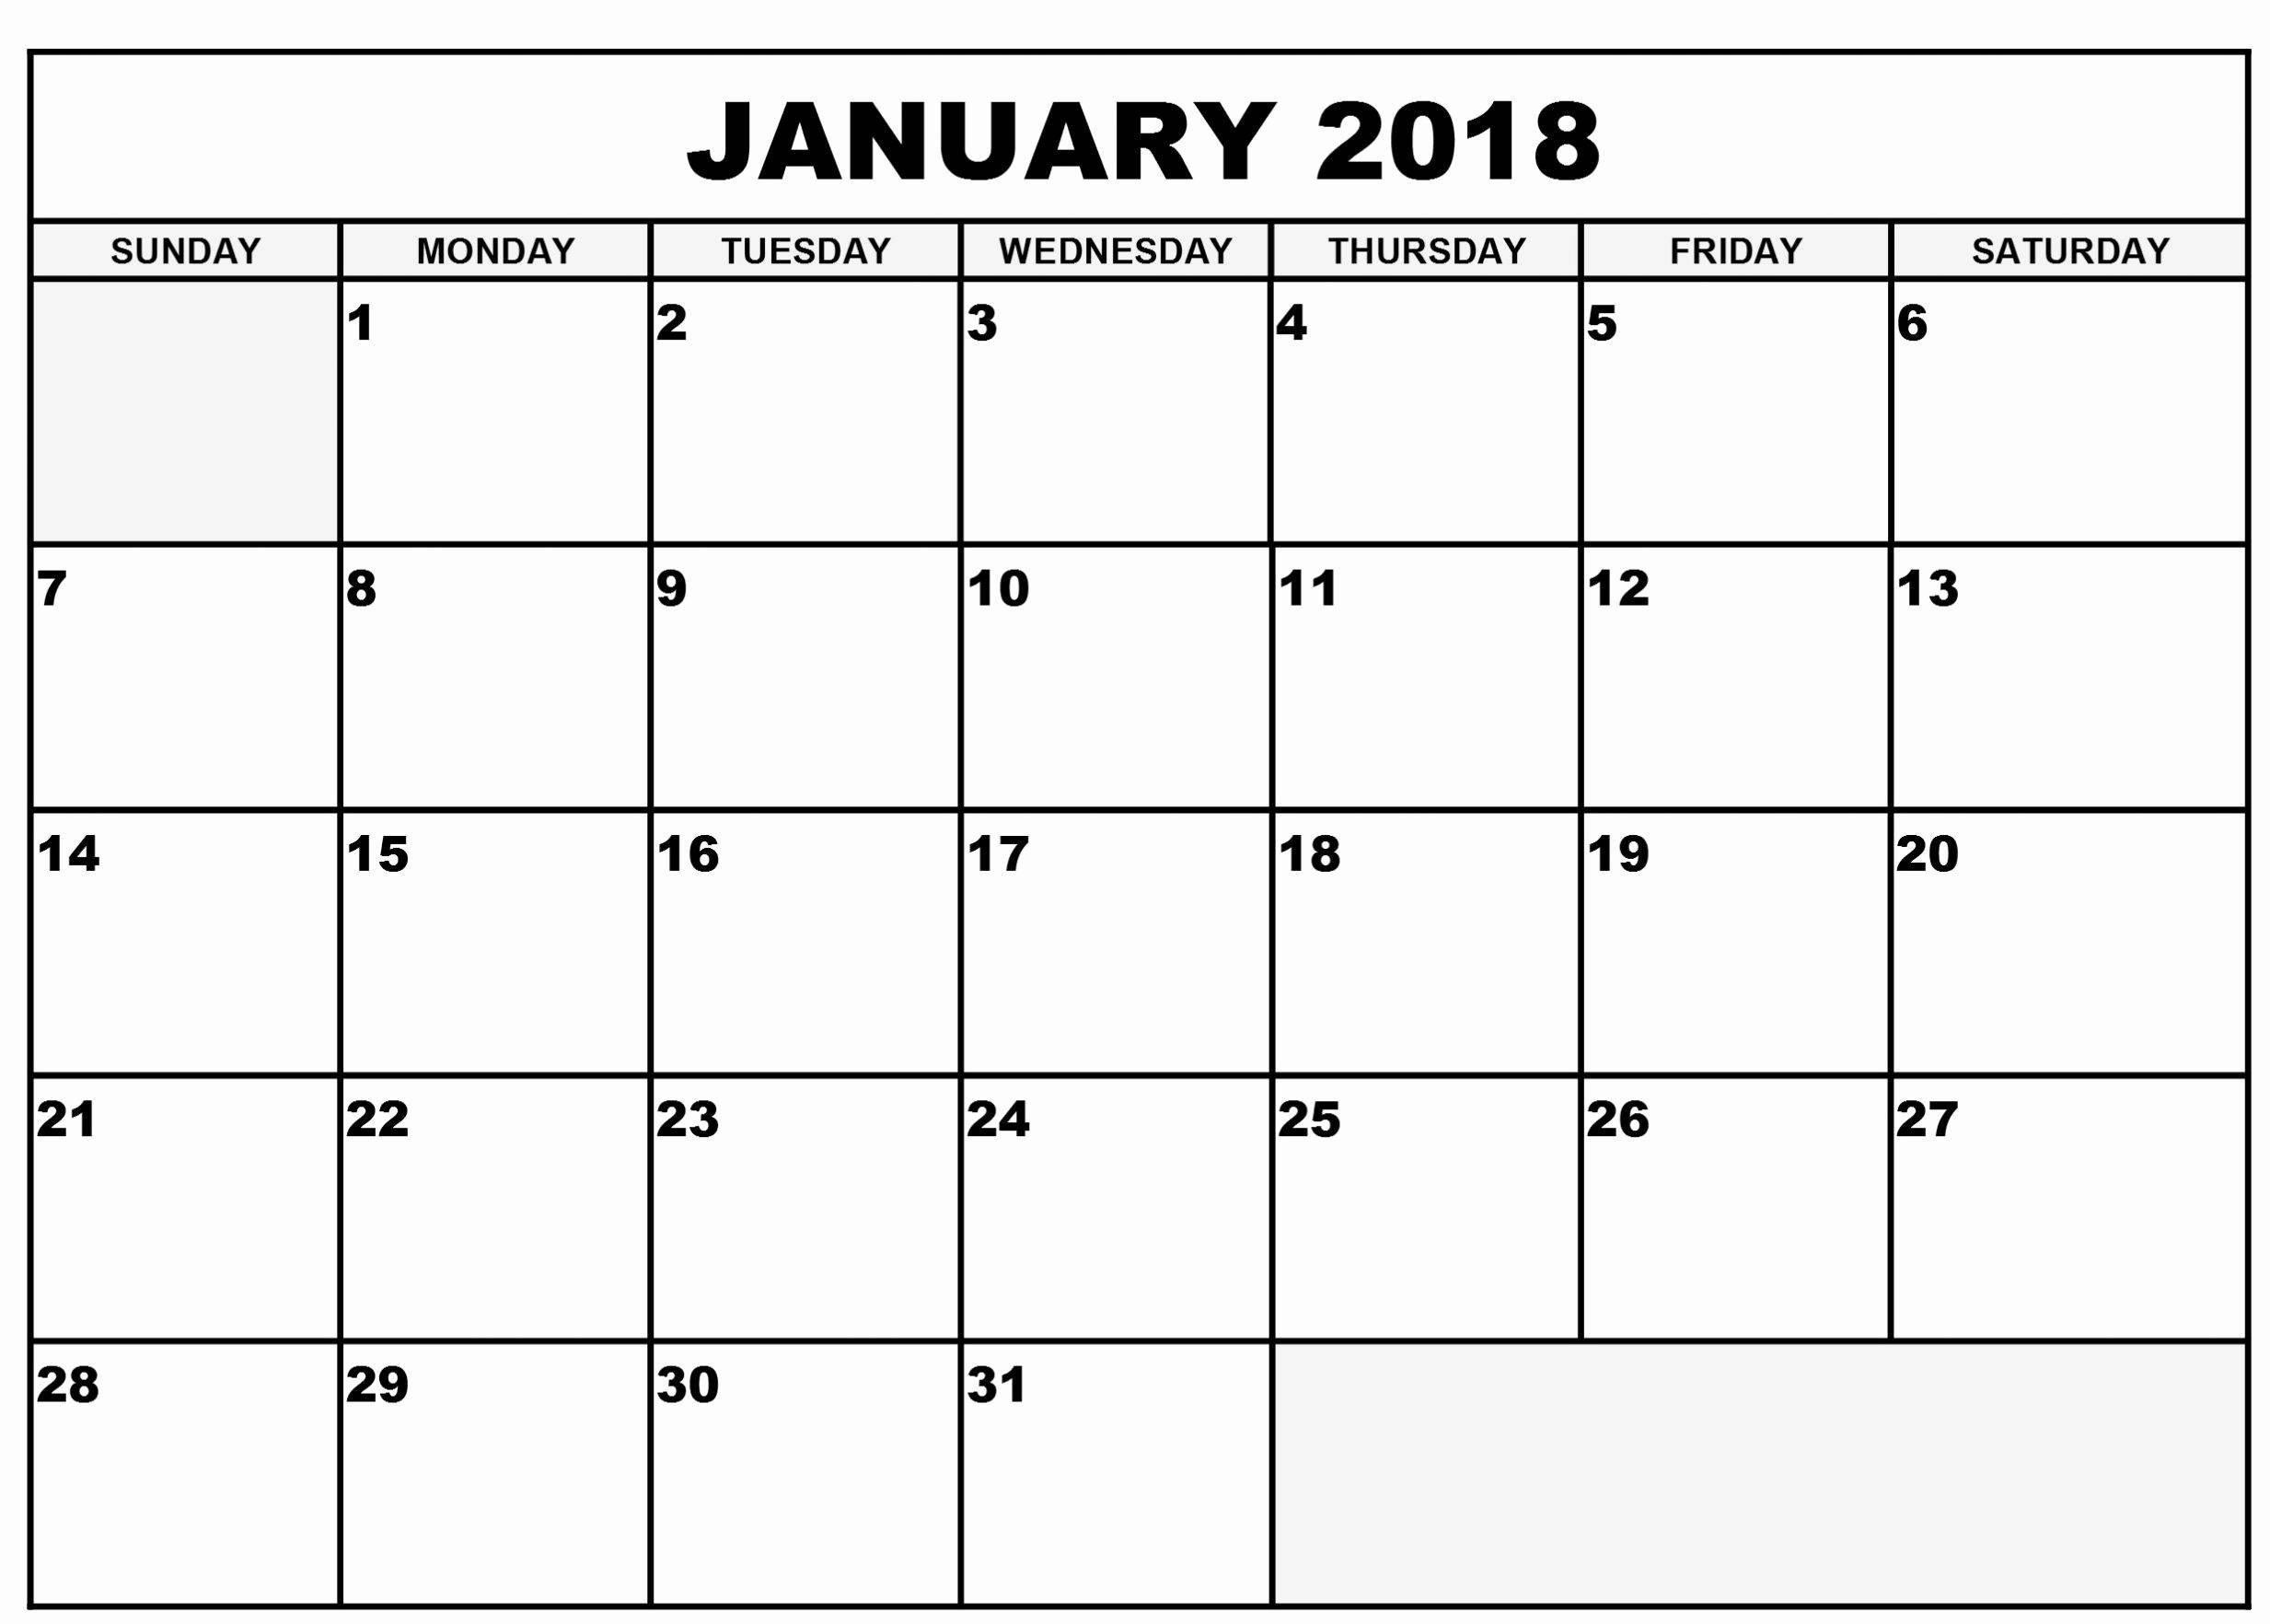 Calendar Templatesvertex42 2019 Printable Calendar Vertex42 Calendar 2019 Vertex 42